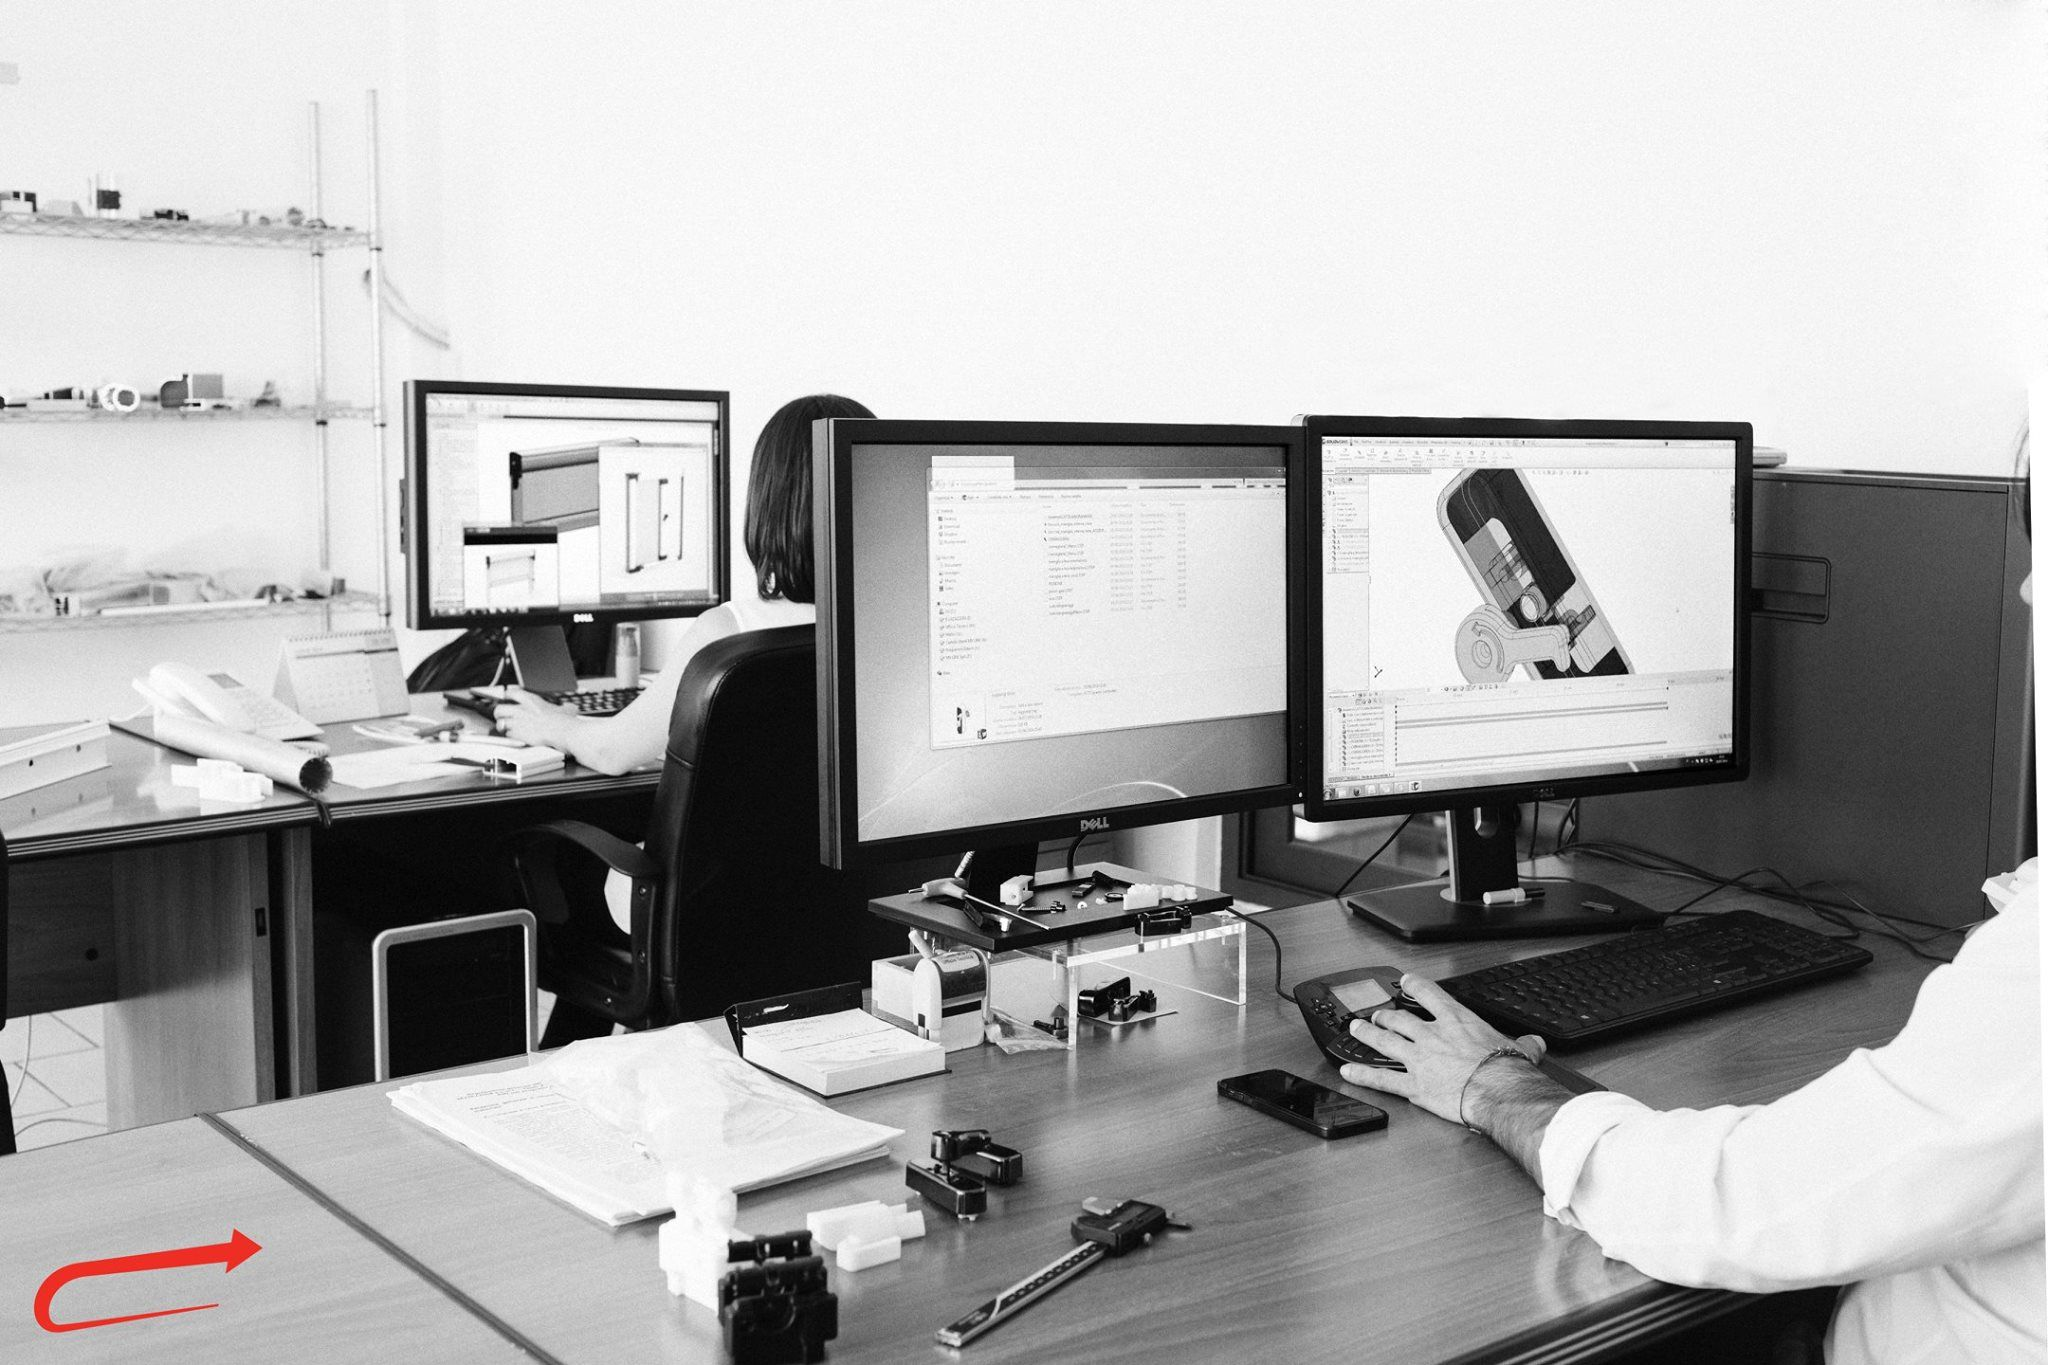 • #Progettiamo i nostri prodotti per soddisfare al massimo le esigenze dei nostri clienti.  • We design our products to meet our customer's needs.  • Diseñamos nuestros productos para satisfacer las necesidades de nuestros clientes.  #MvLine #Ricerca #Sperimentazione #MadeInItaly → www.mvline.it